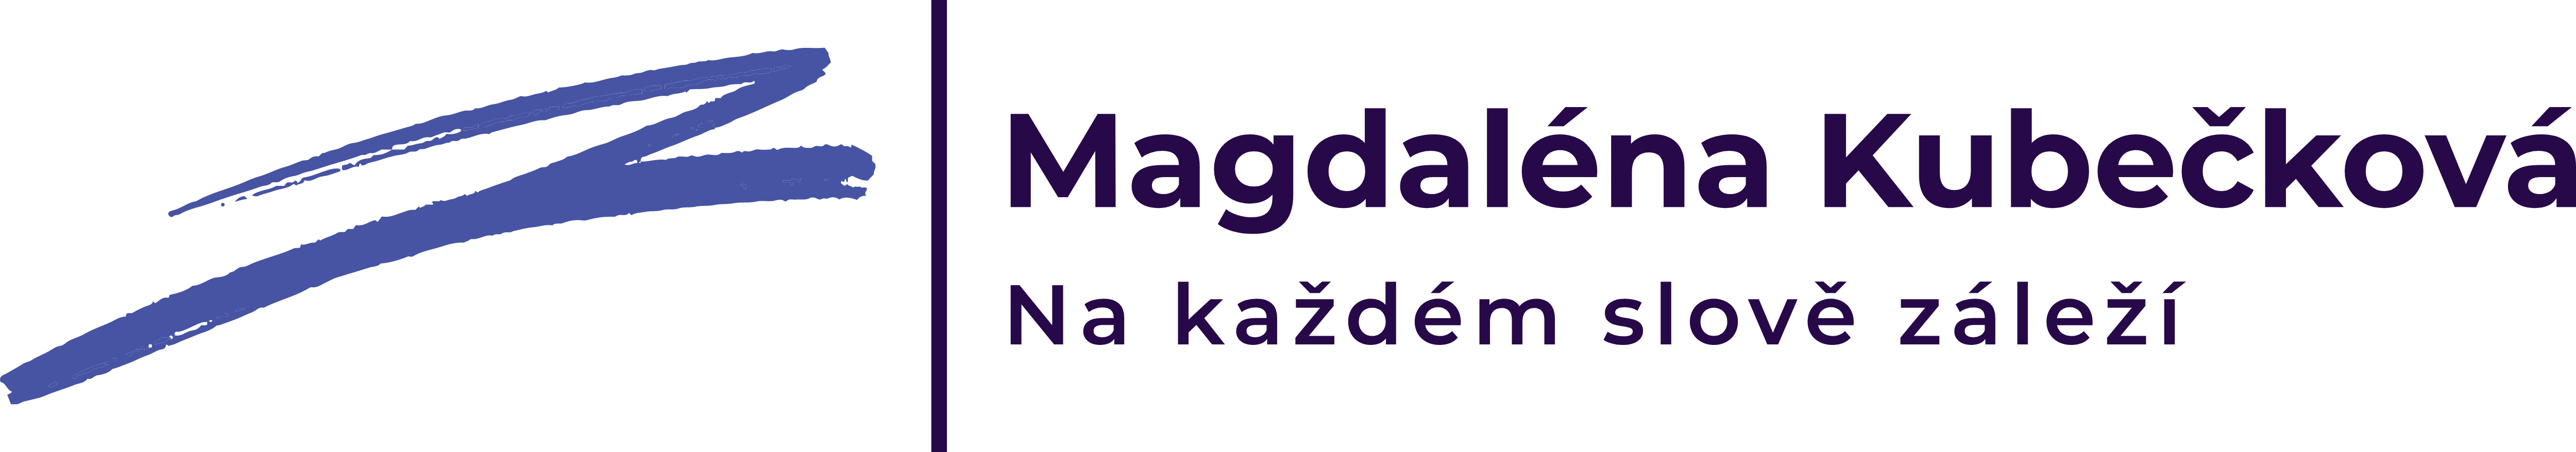 copywriting, logo